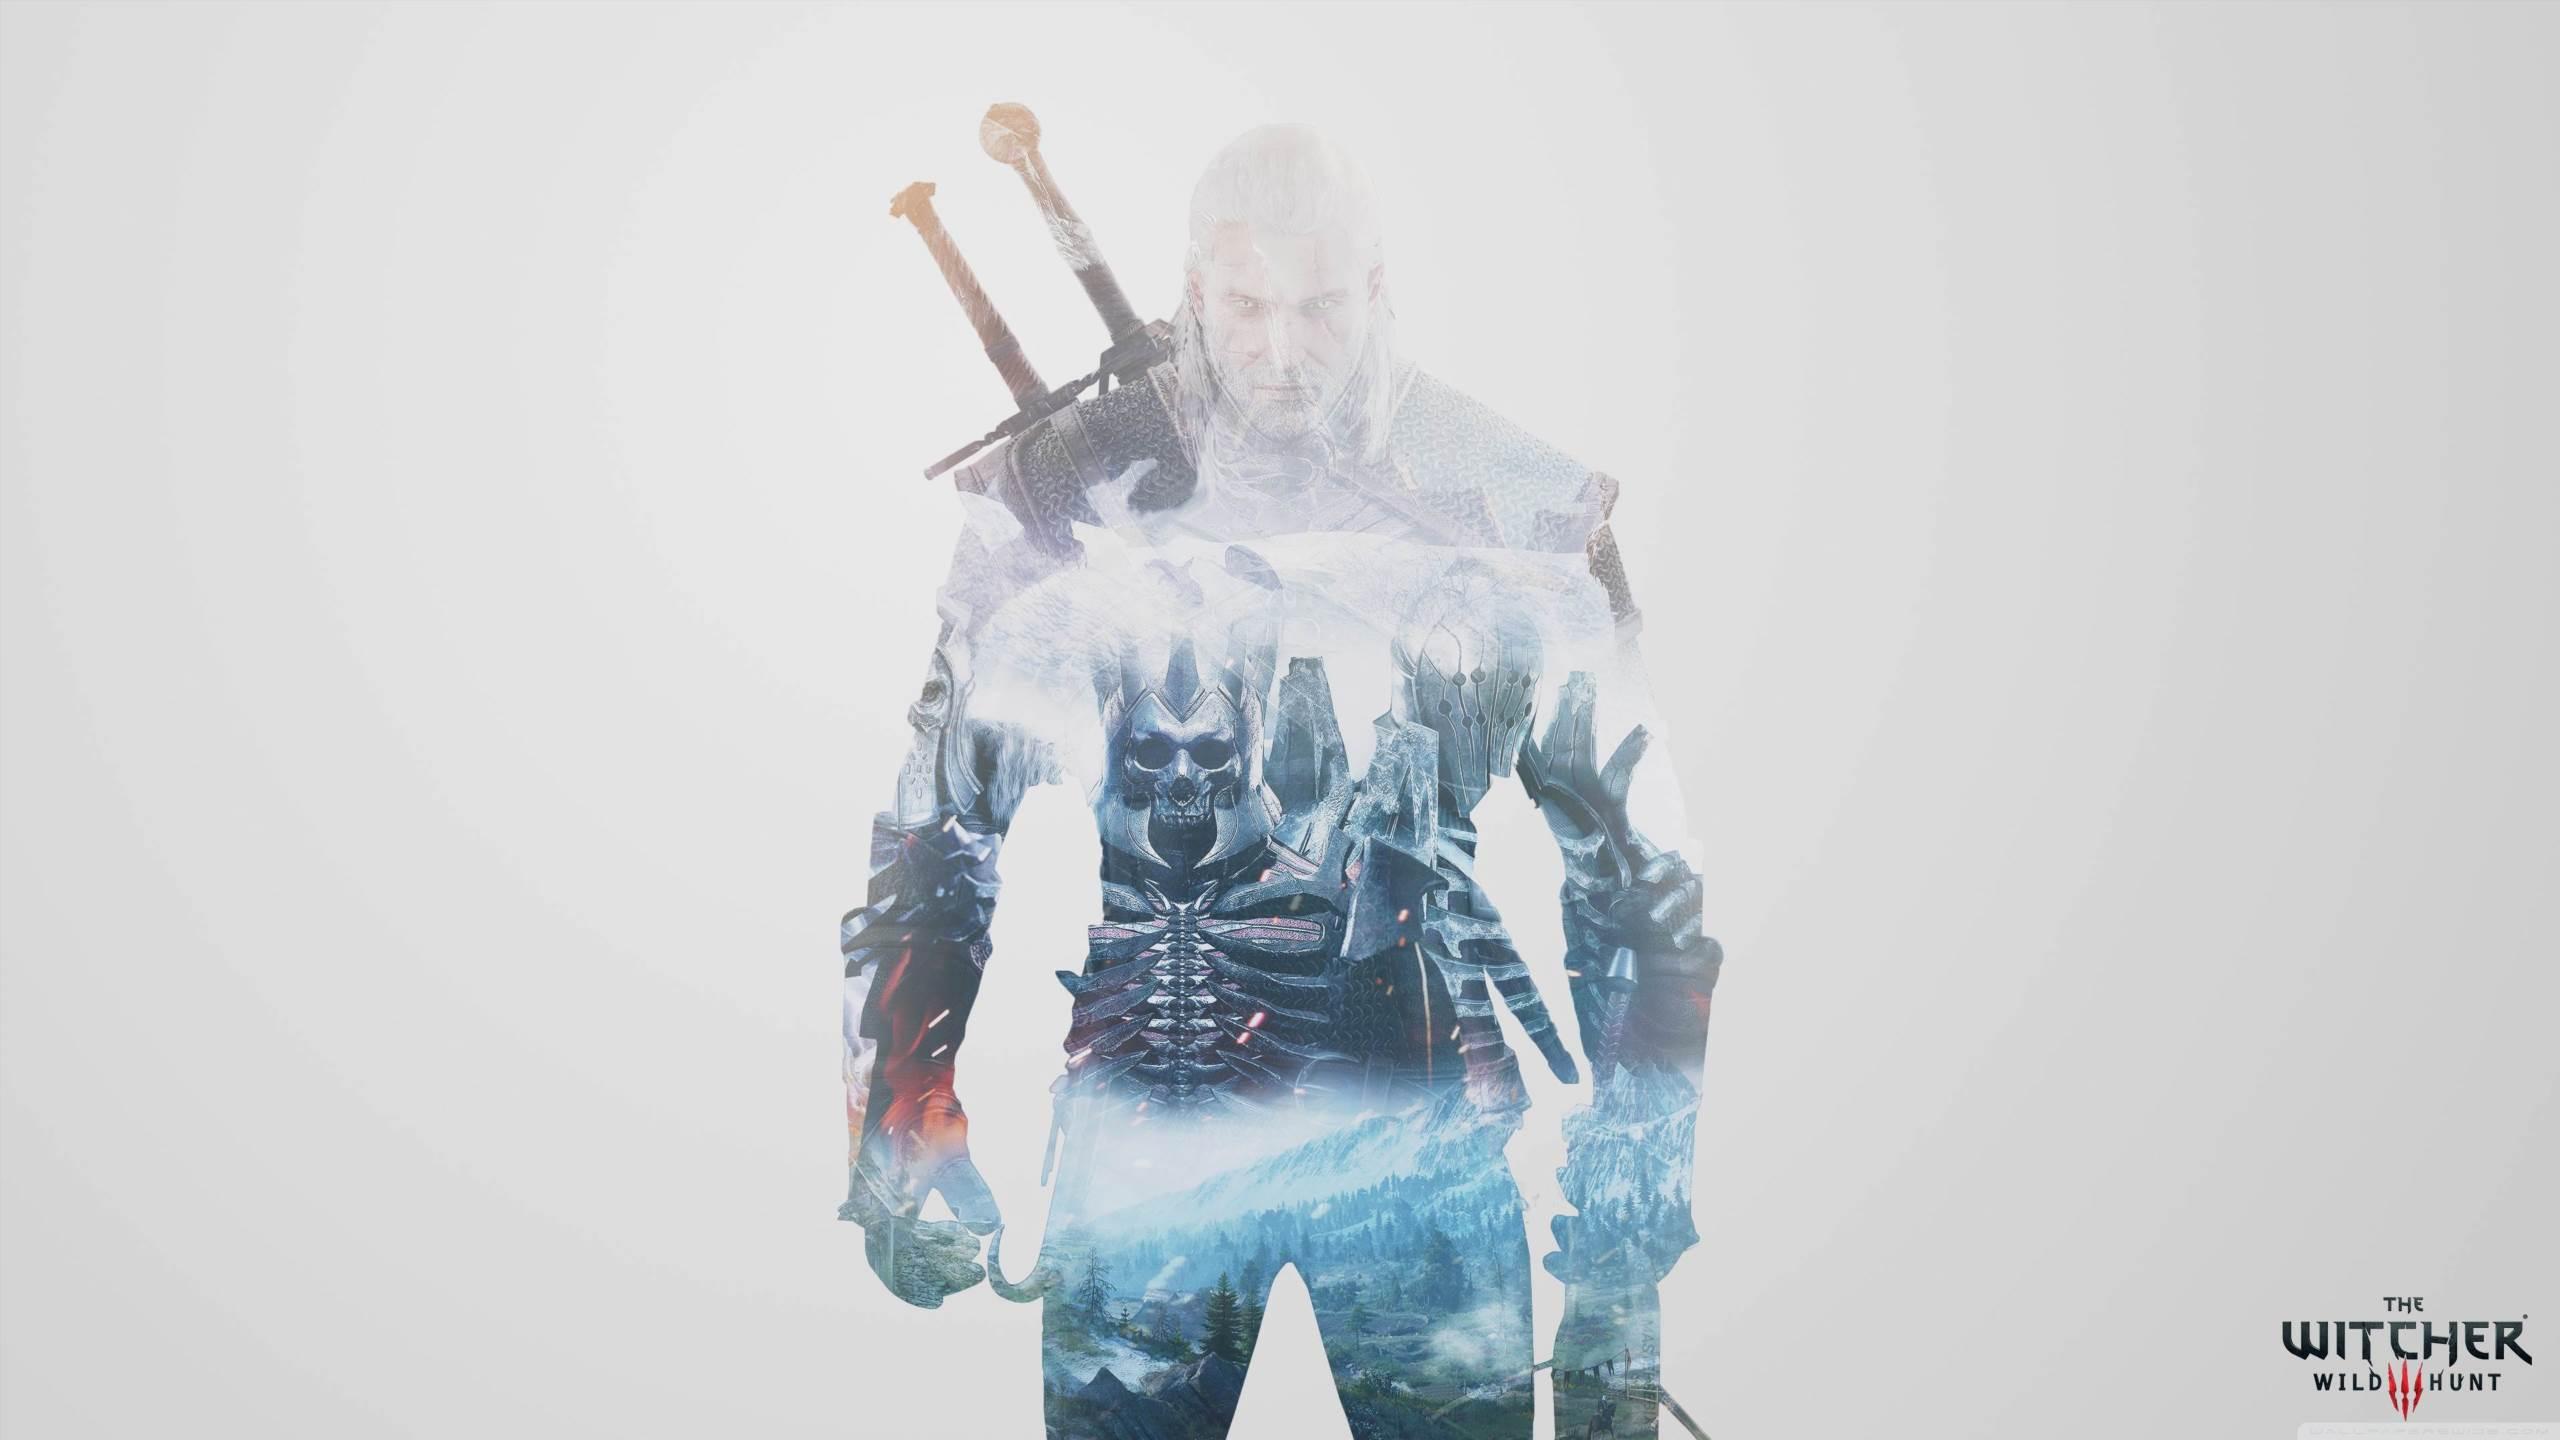 Witcher 3 Wild Hunt Hd Desktop Wallpaper High Definition